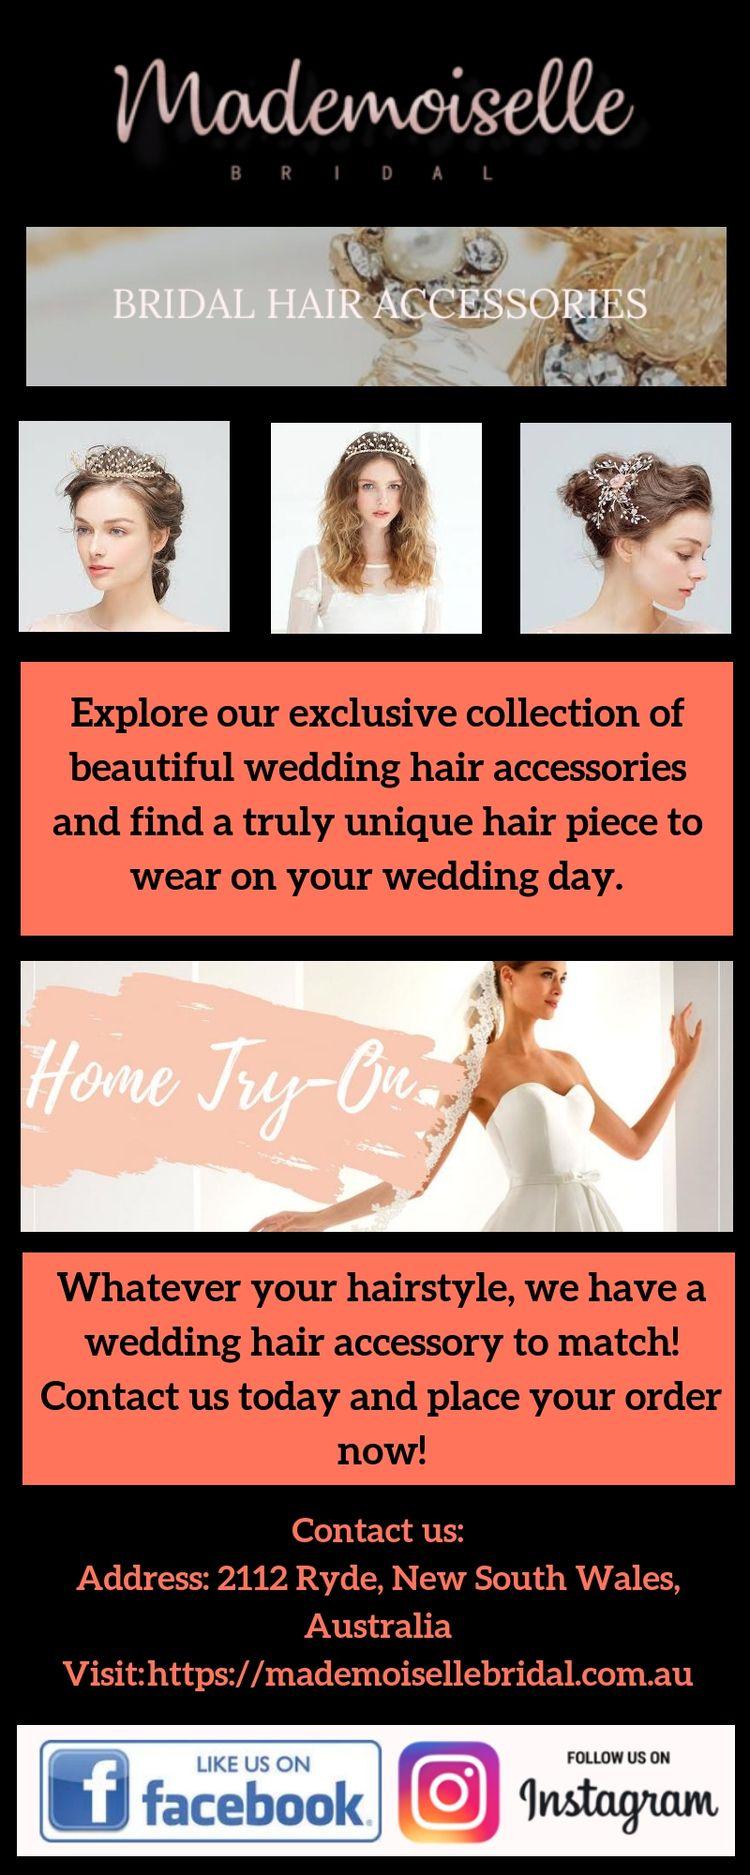 Wedding Hair Accessories - Made - mademoisellebridal   ello